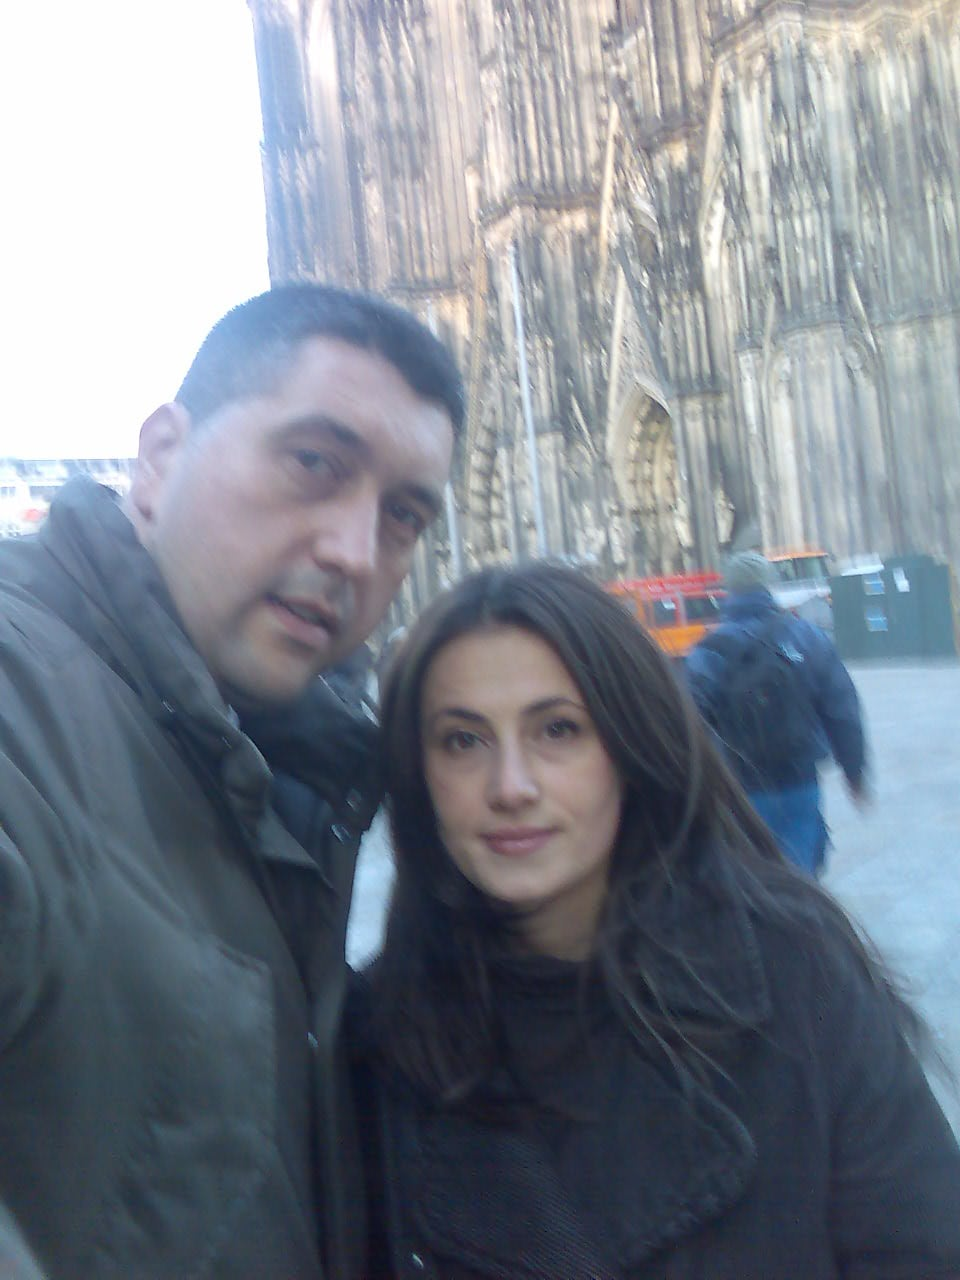 Amina From Sarajevo, Bosnia and Herzegovina